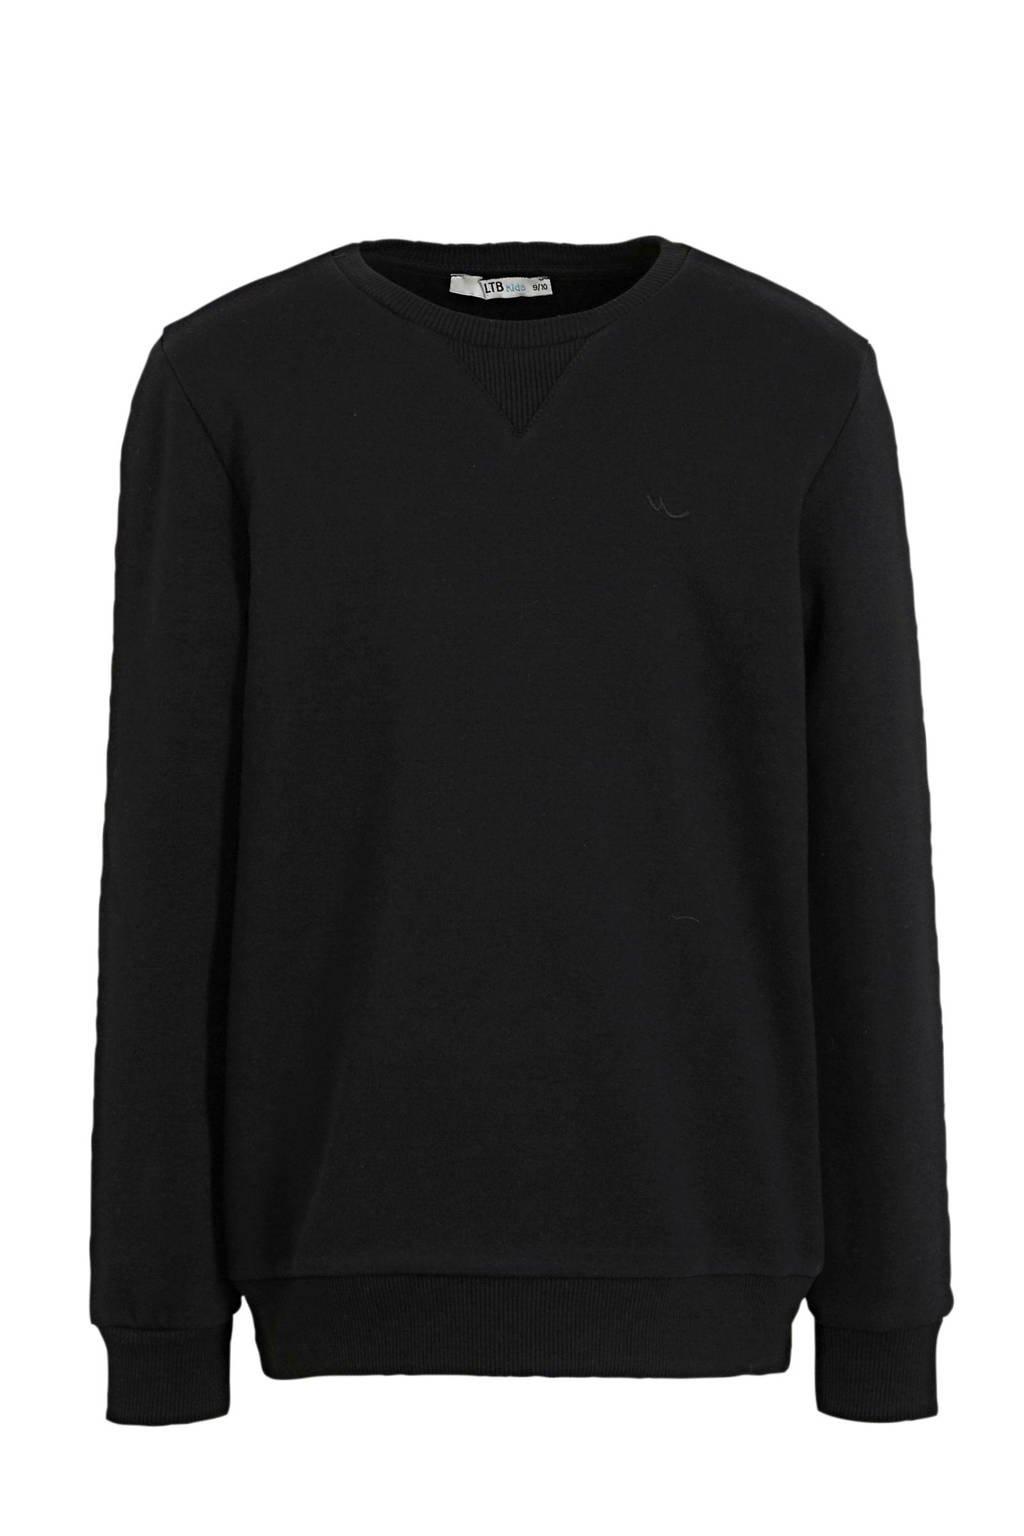 LTB sweater Wimaso zwart, Zwart